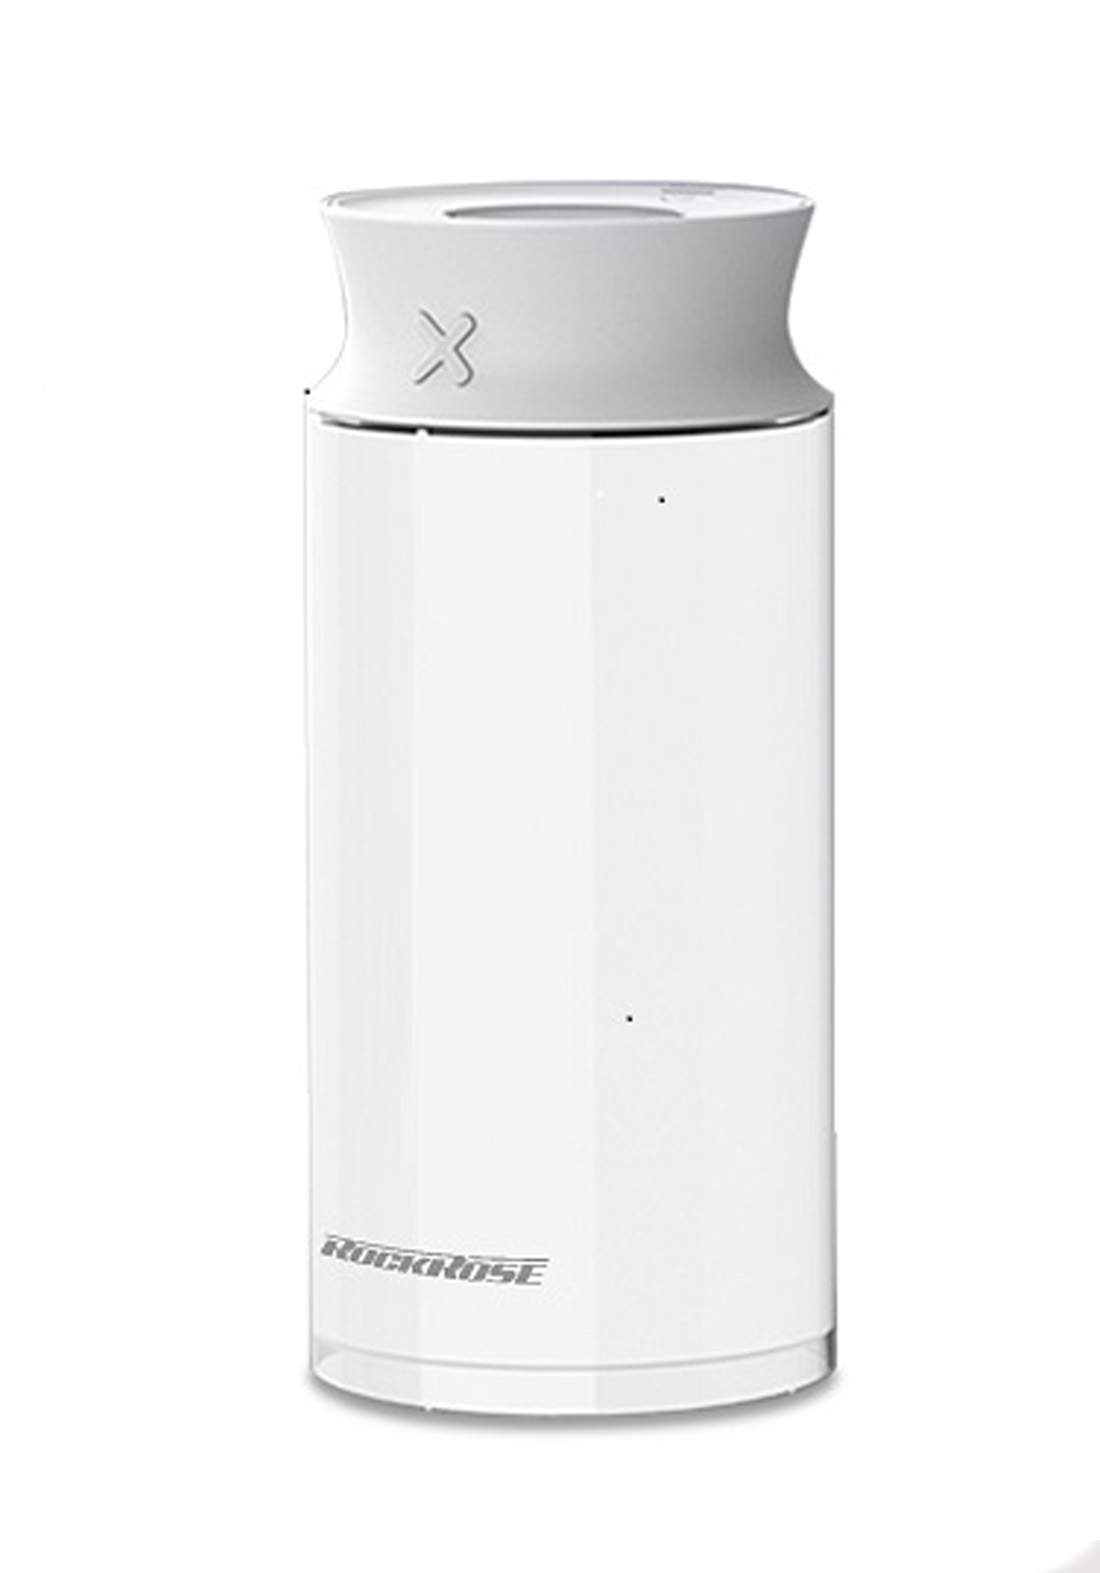 (4164)Rockrose RRCT06 Aquas Max Portable Cool Mist Humidifier جهاز ترطيب الجو المحمول